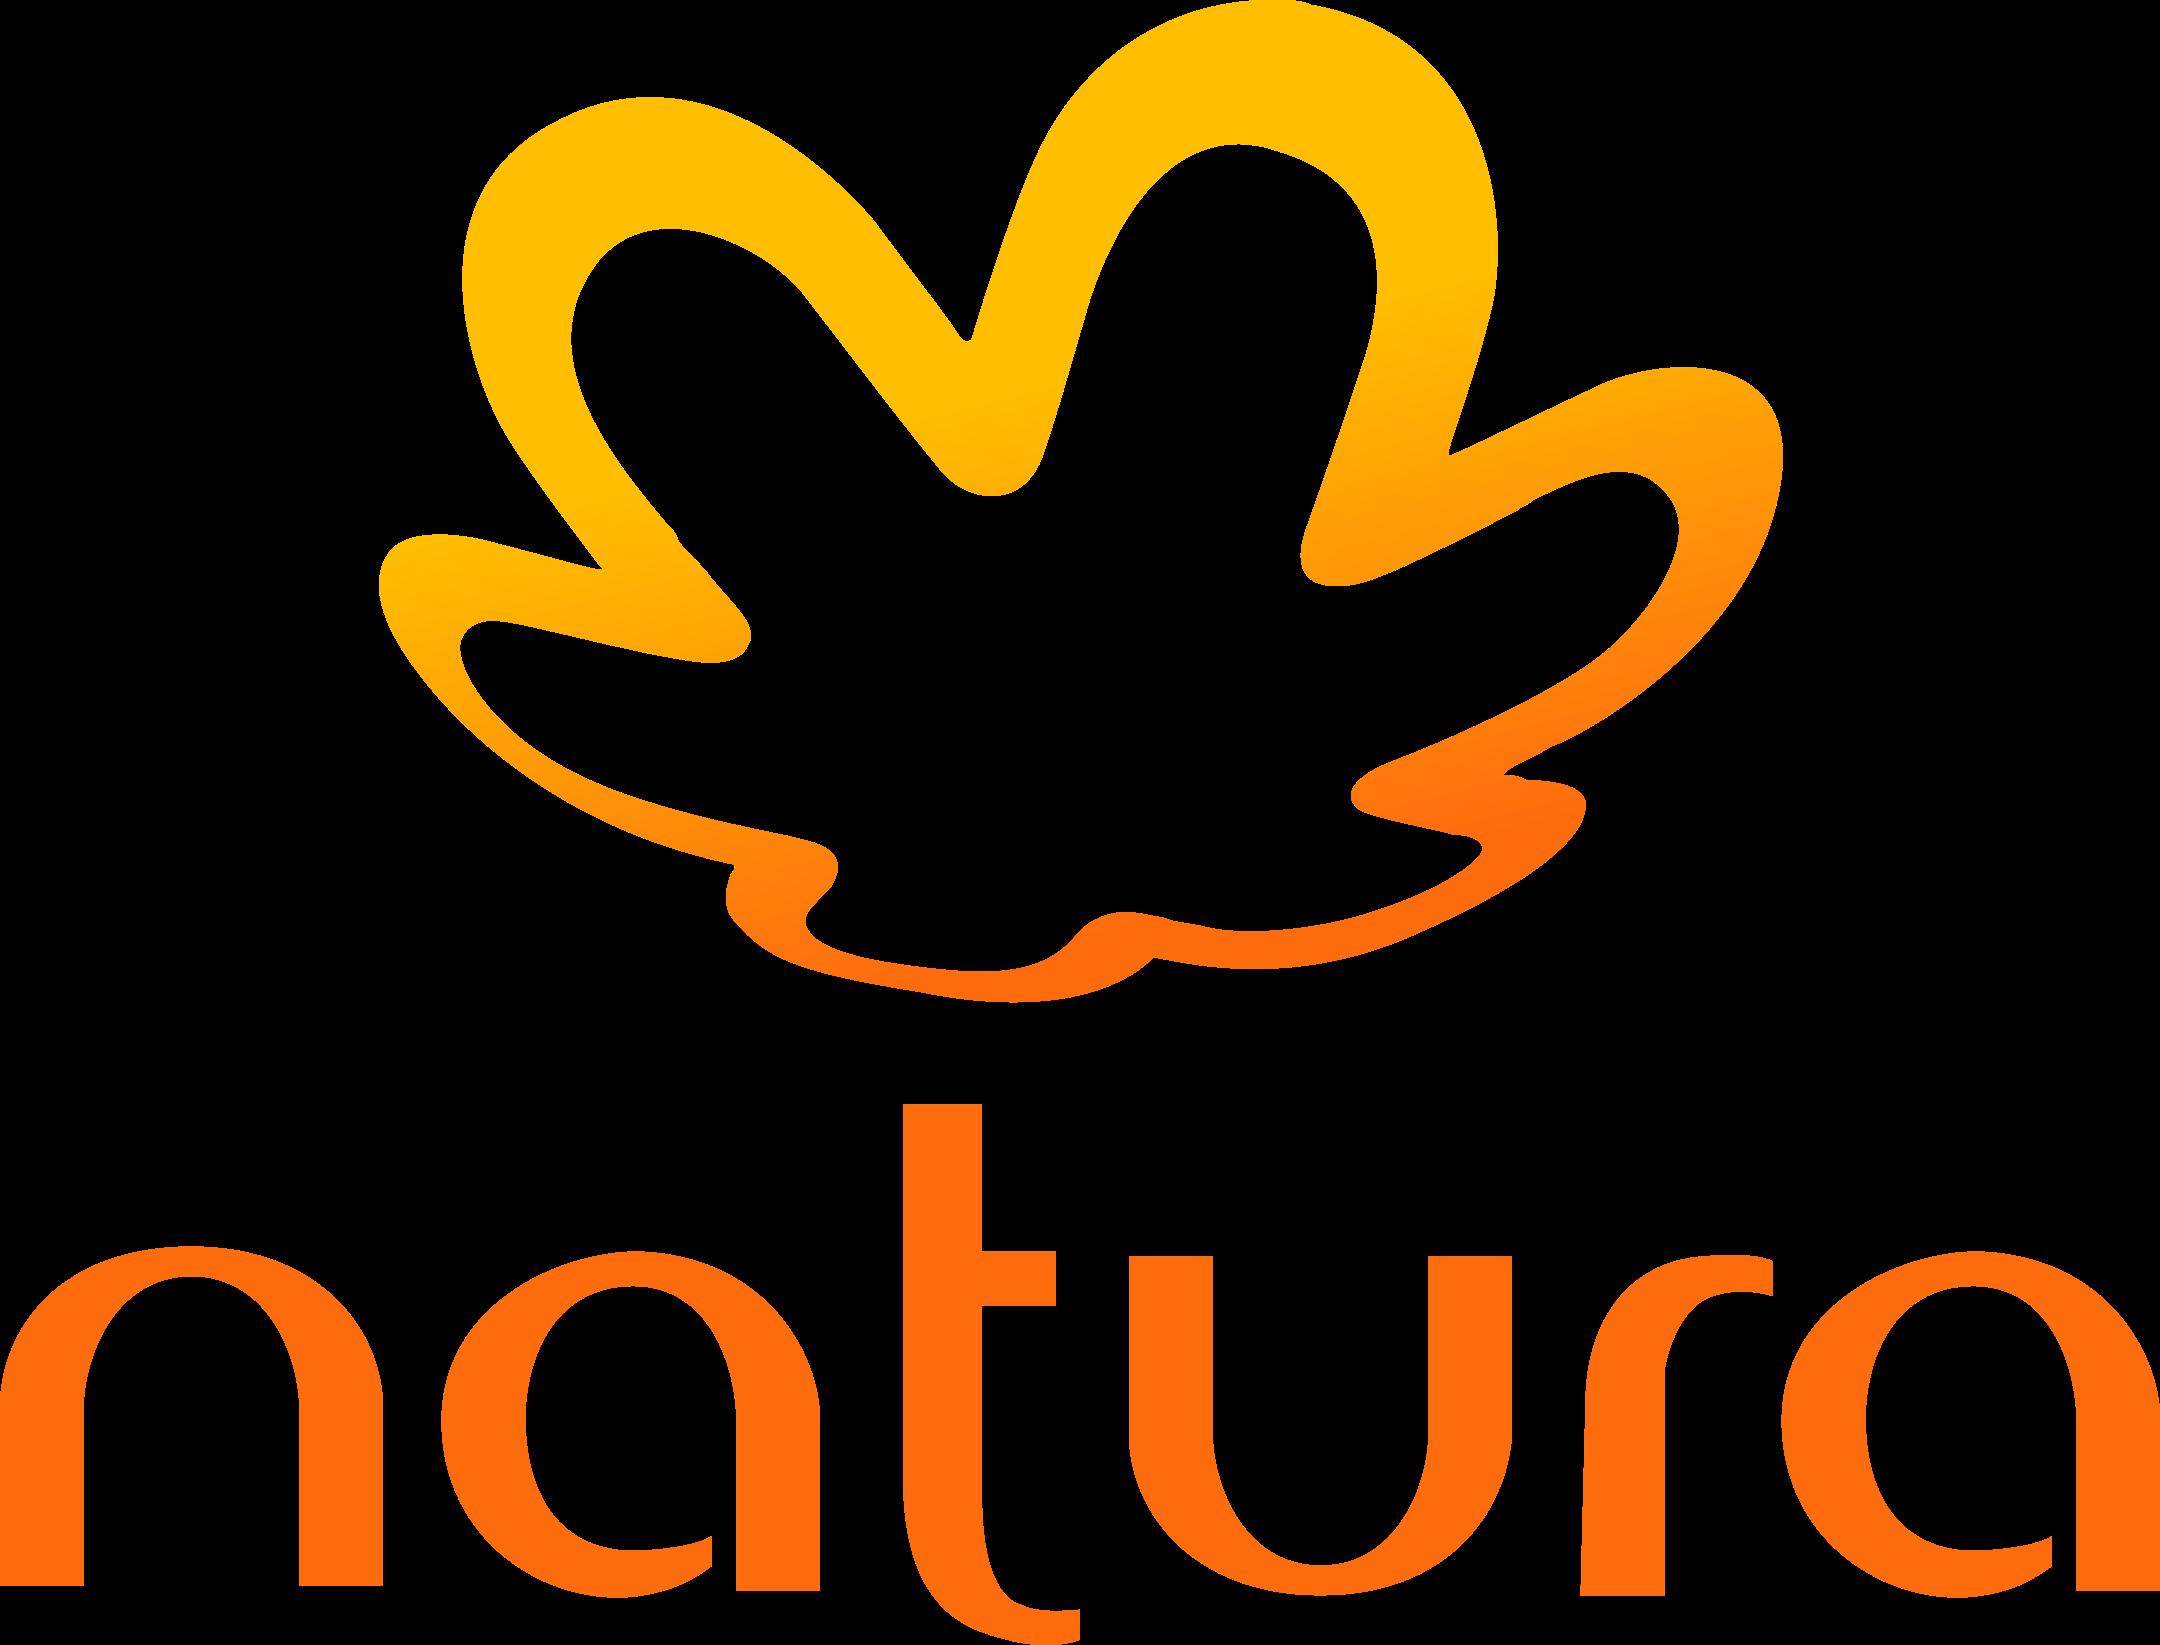 natura logo 1 1 - Natura Logo